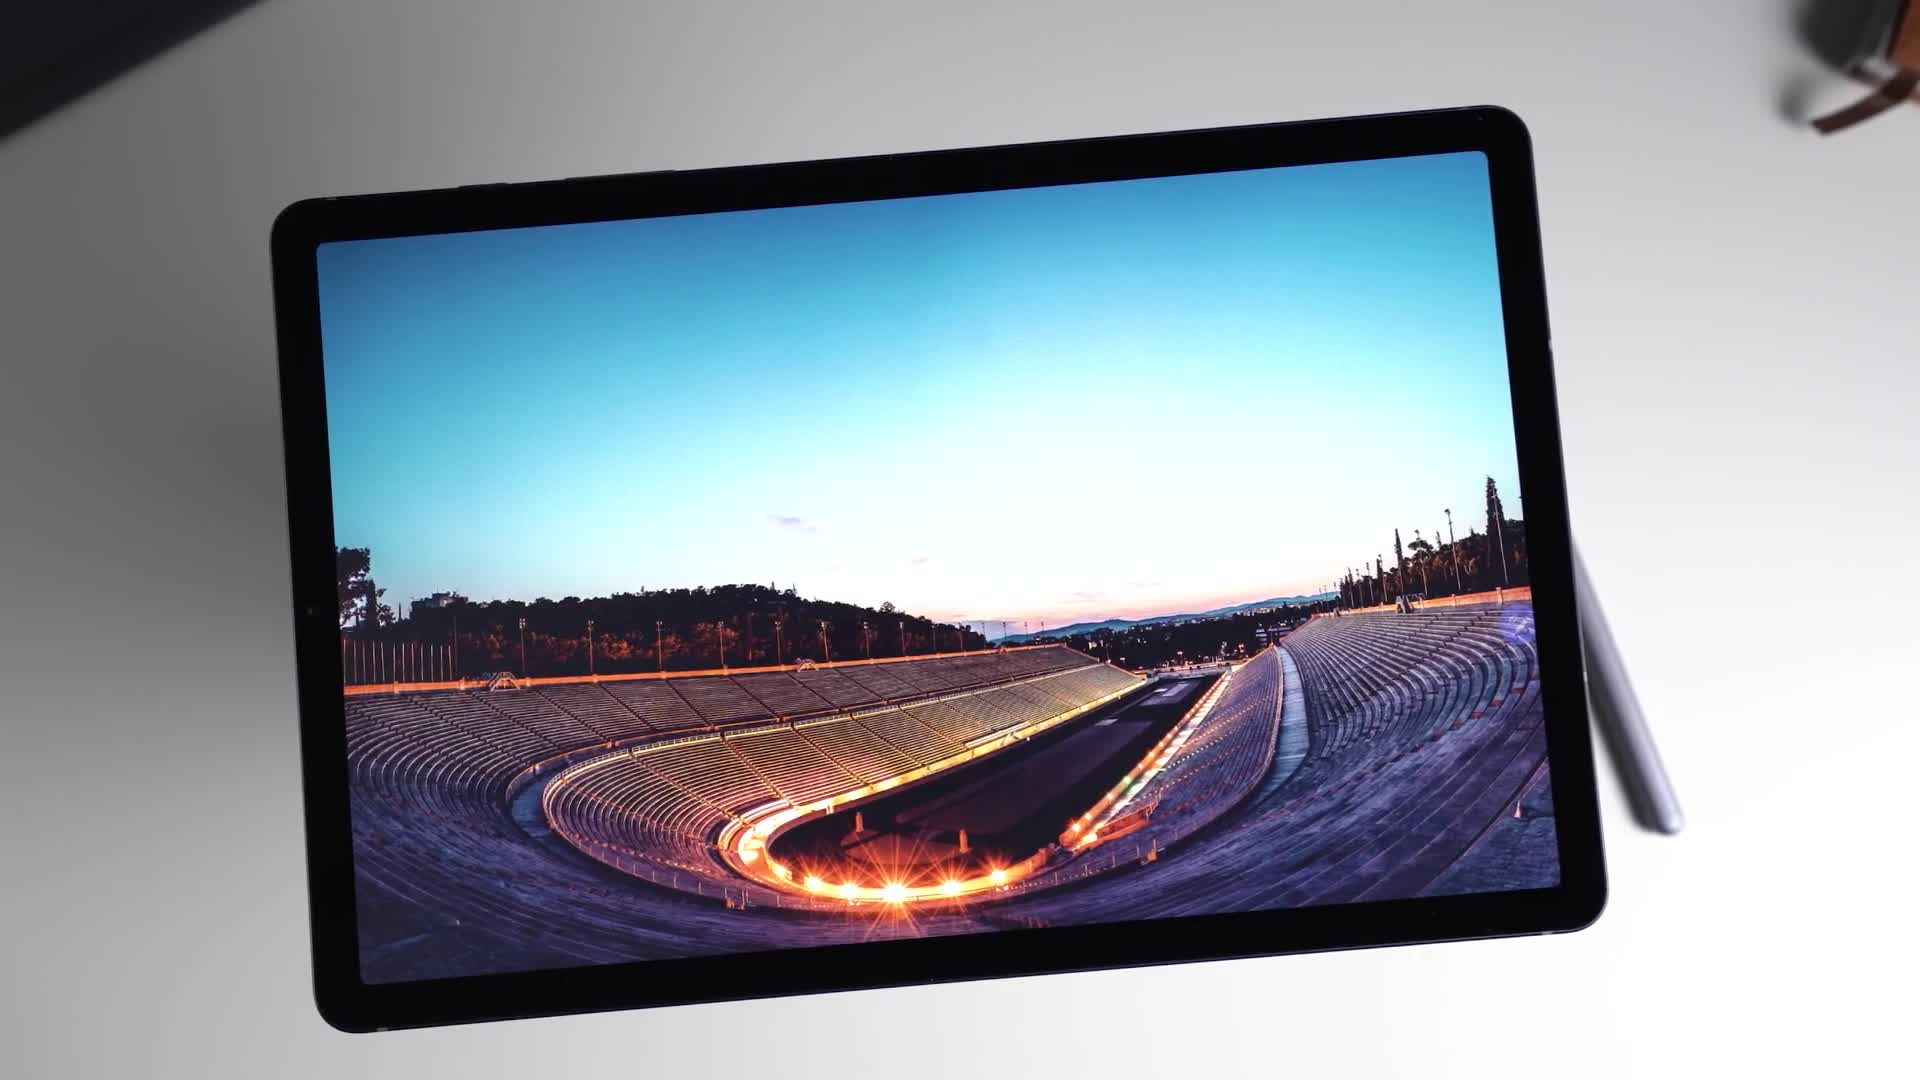 Android, Tablet, Samsung, Test, Galaxy, Samsung Galaxy, Andrzej Tokarski, Tabletblog, Samsung Mobile, Android 9.0, Android 9.0 Pie, S Pen, Samsung Galaxy Tab S6, Galaxy Tab S6